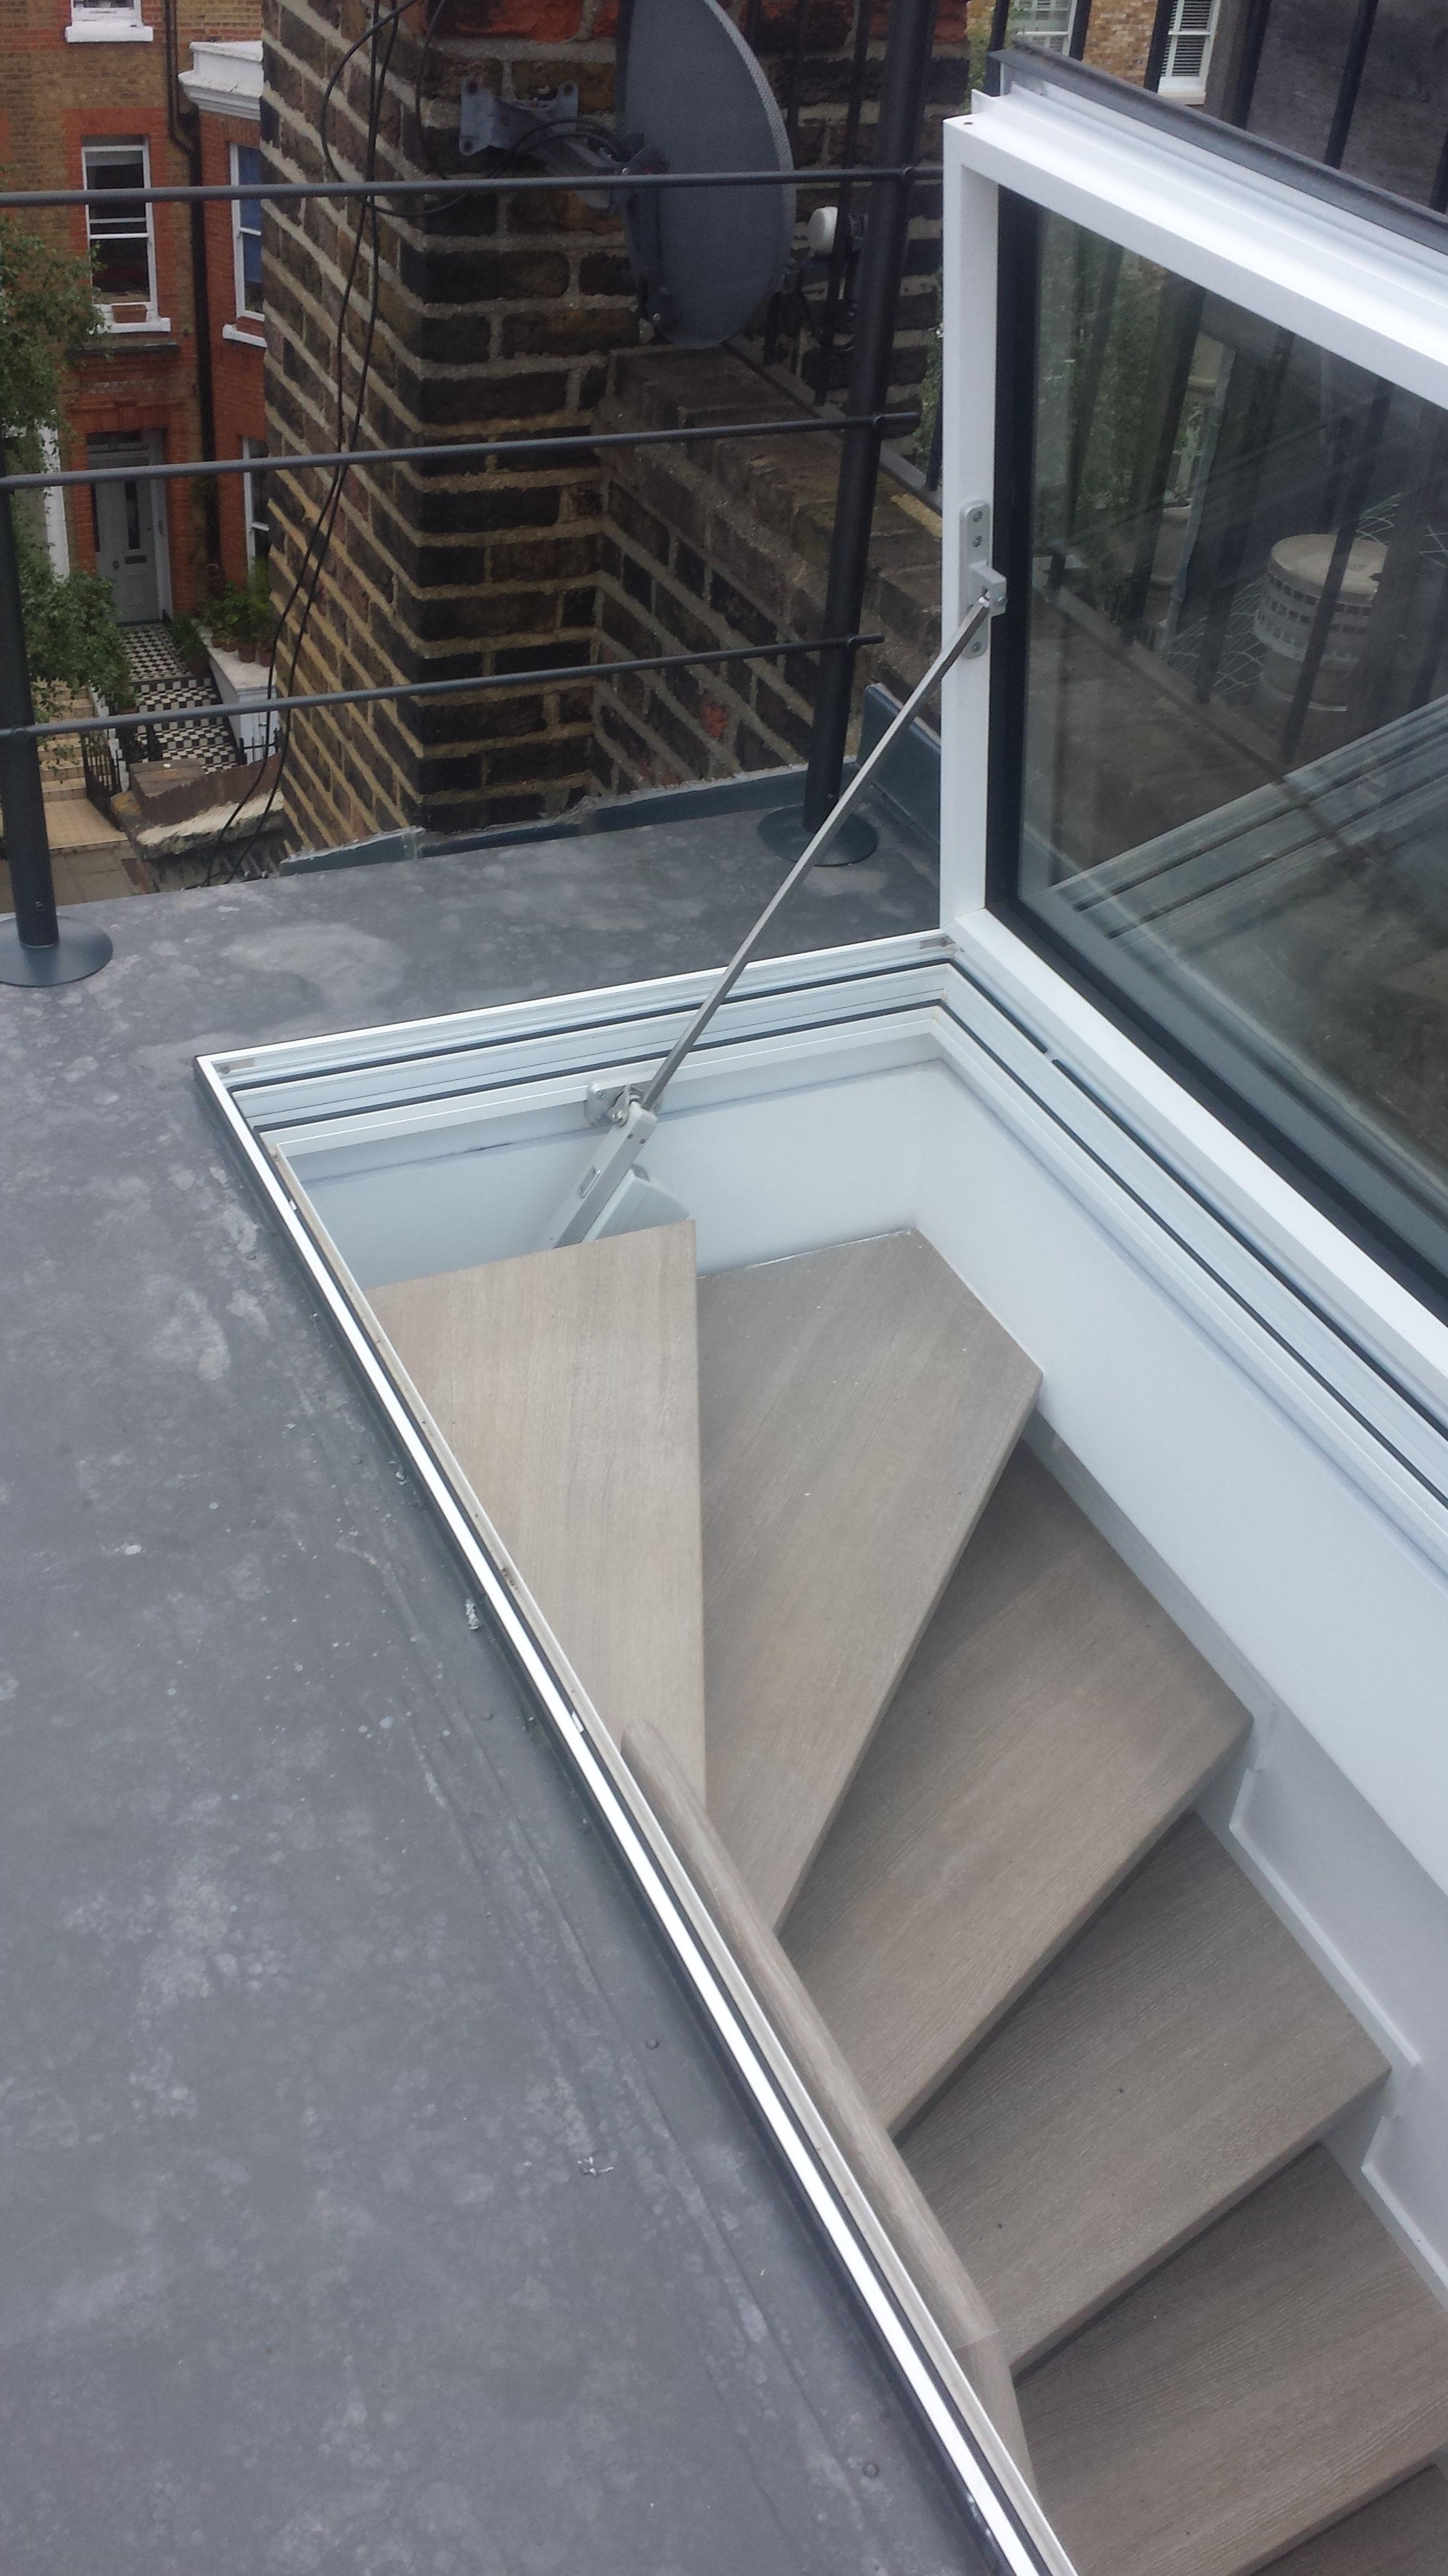 midos rooflights outside window